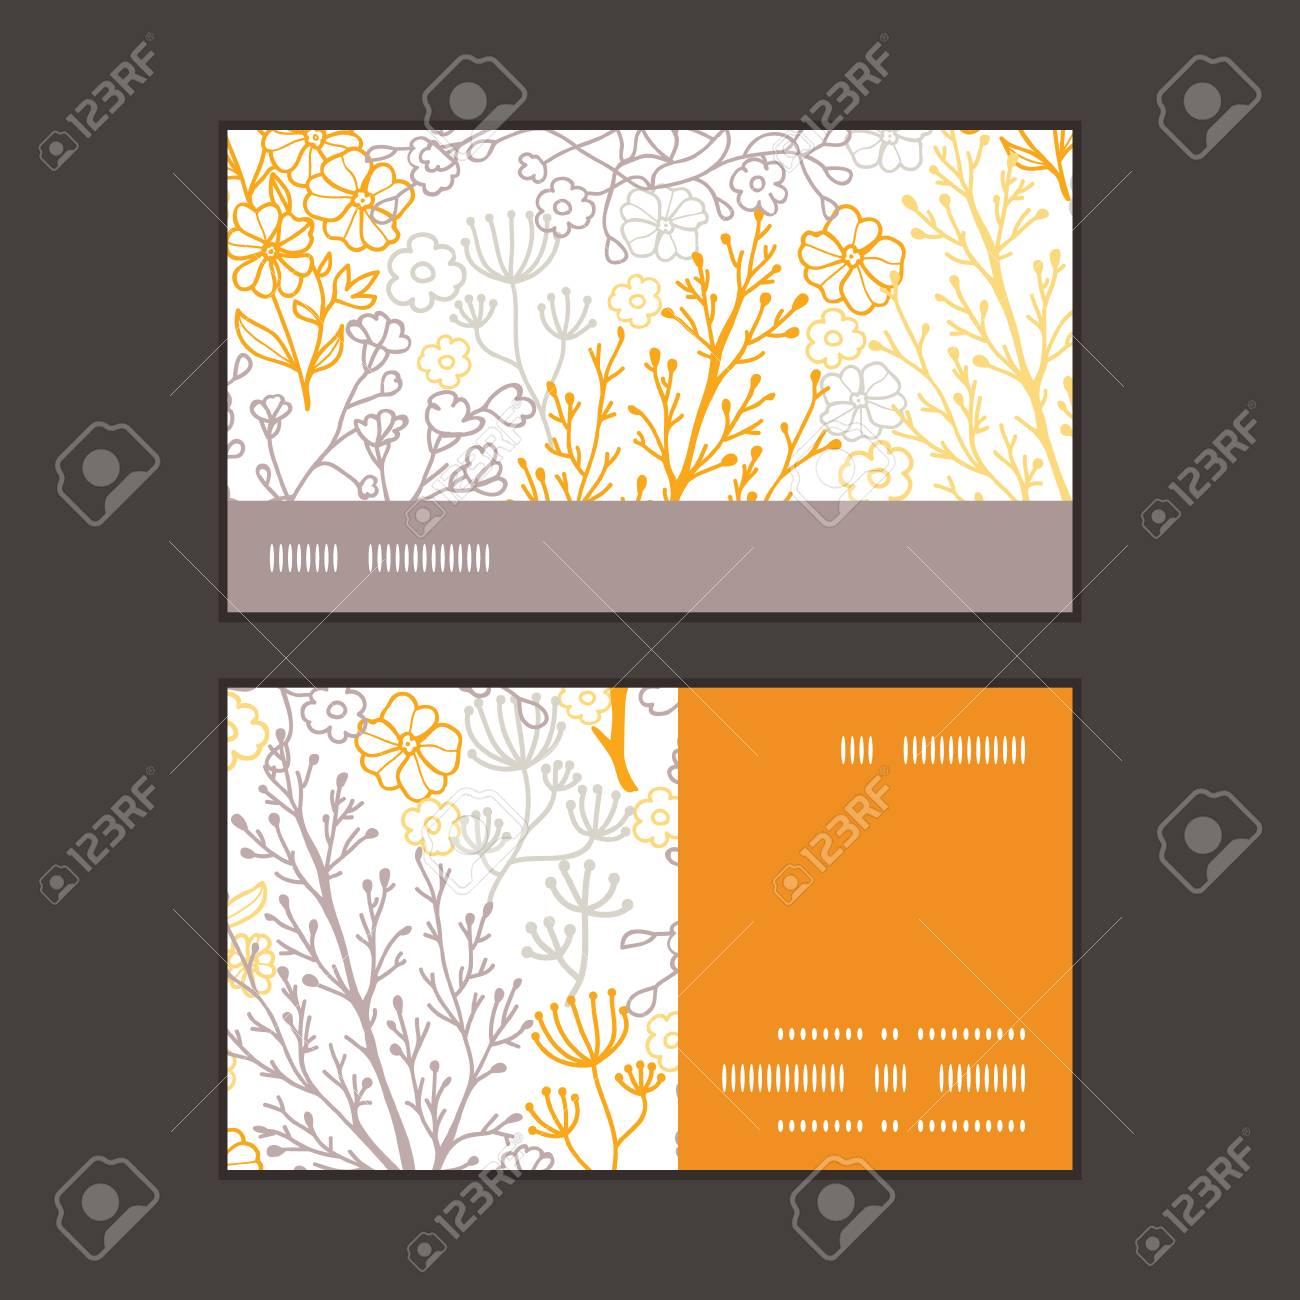 Vector Magiques Floraux Bande Horizontale Motif Dencadrement Cartes